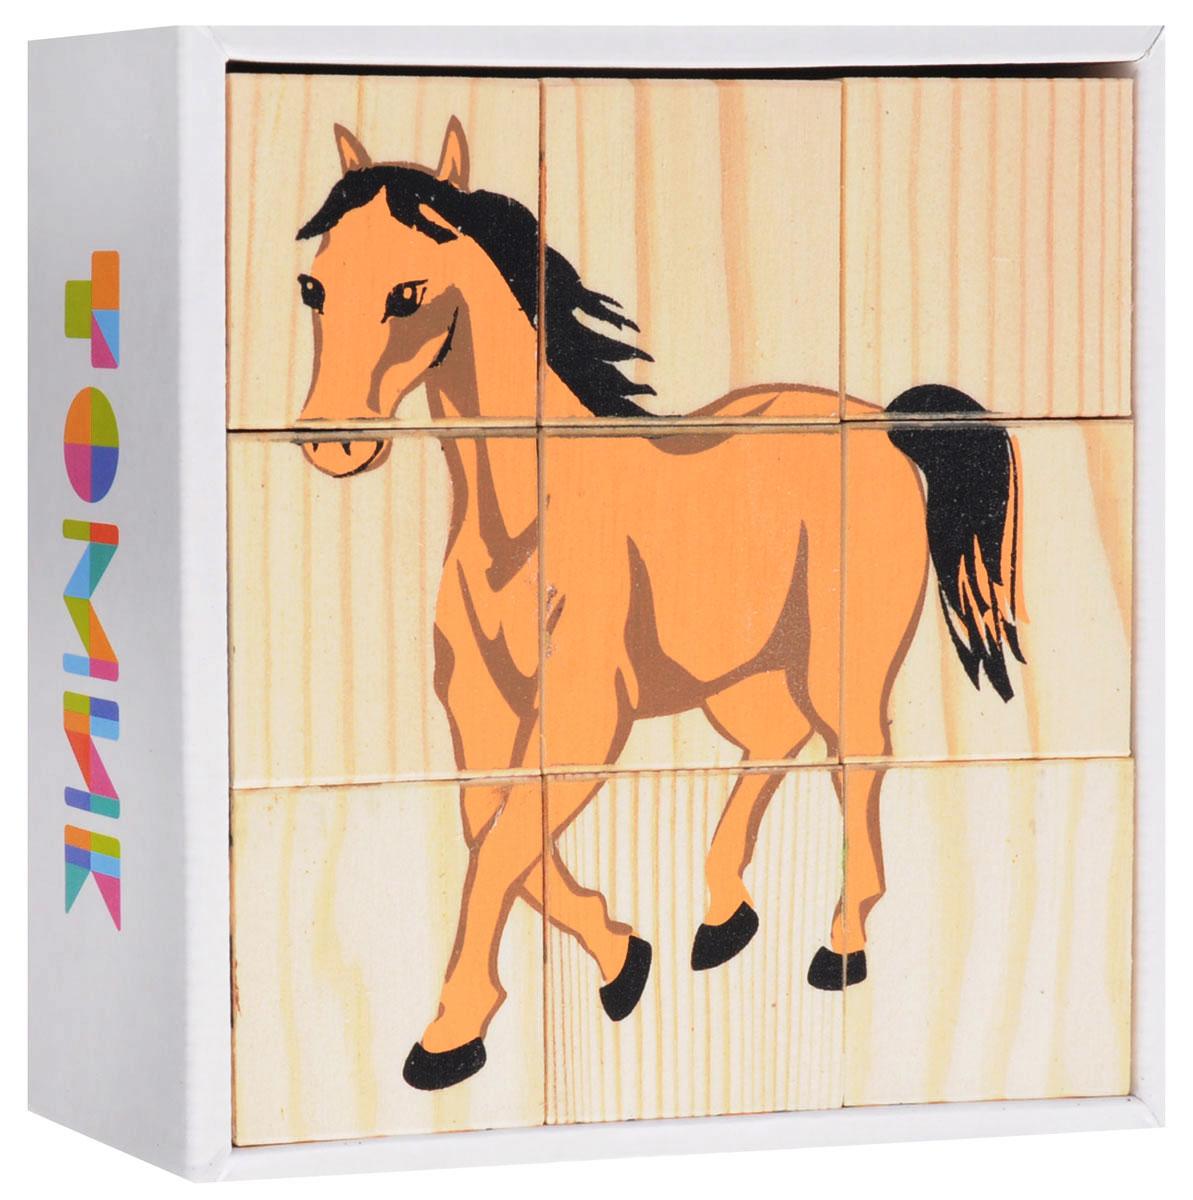 Томик Кубики Домашние животные кубики томик домашние животные